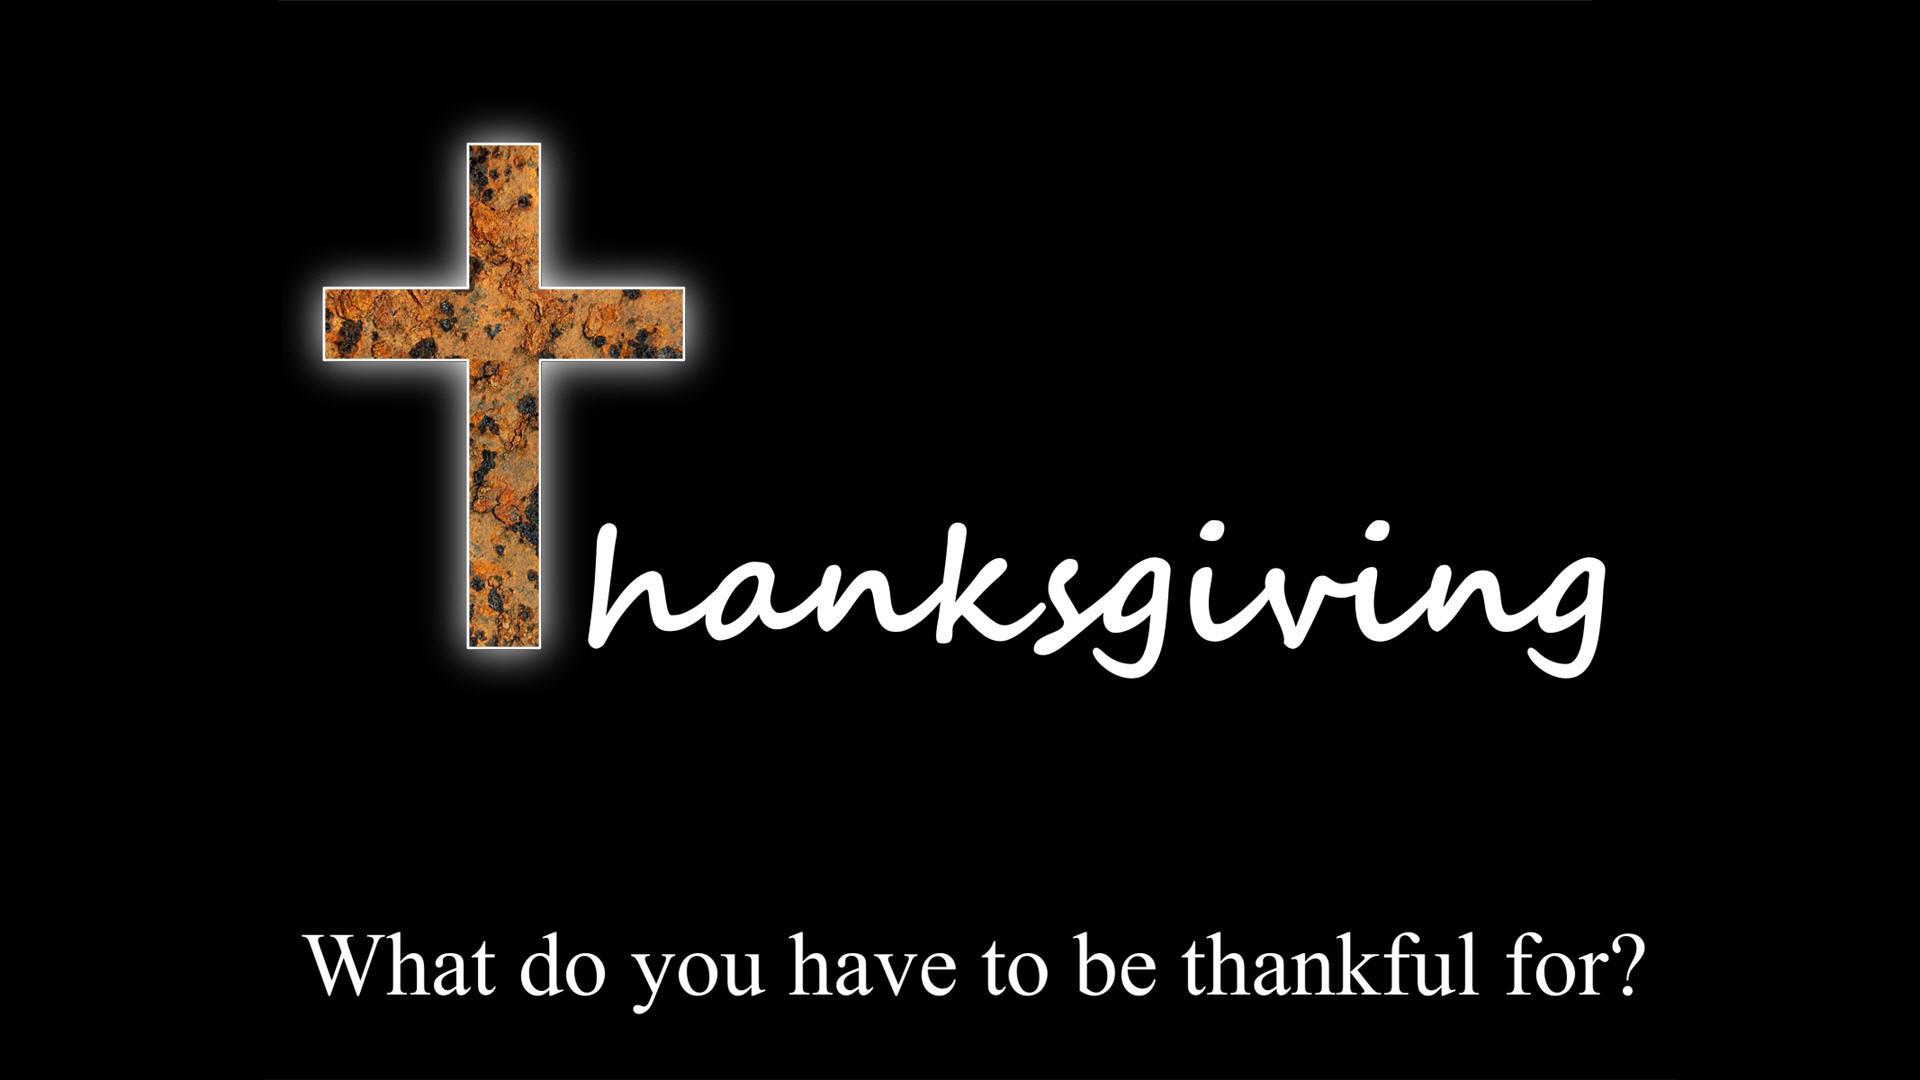 thanksgiving wallpapers christian. Â«Â«